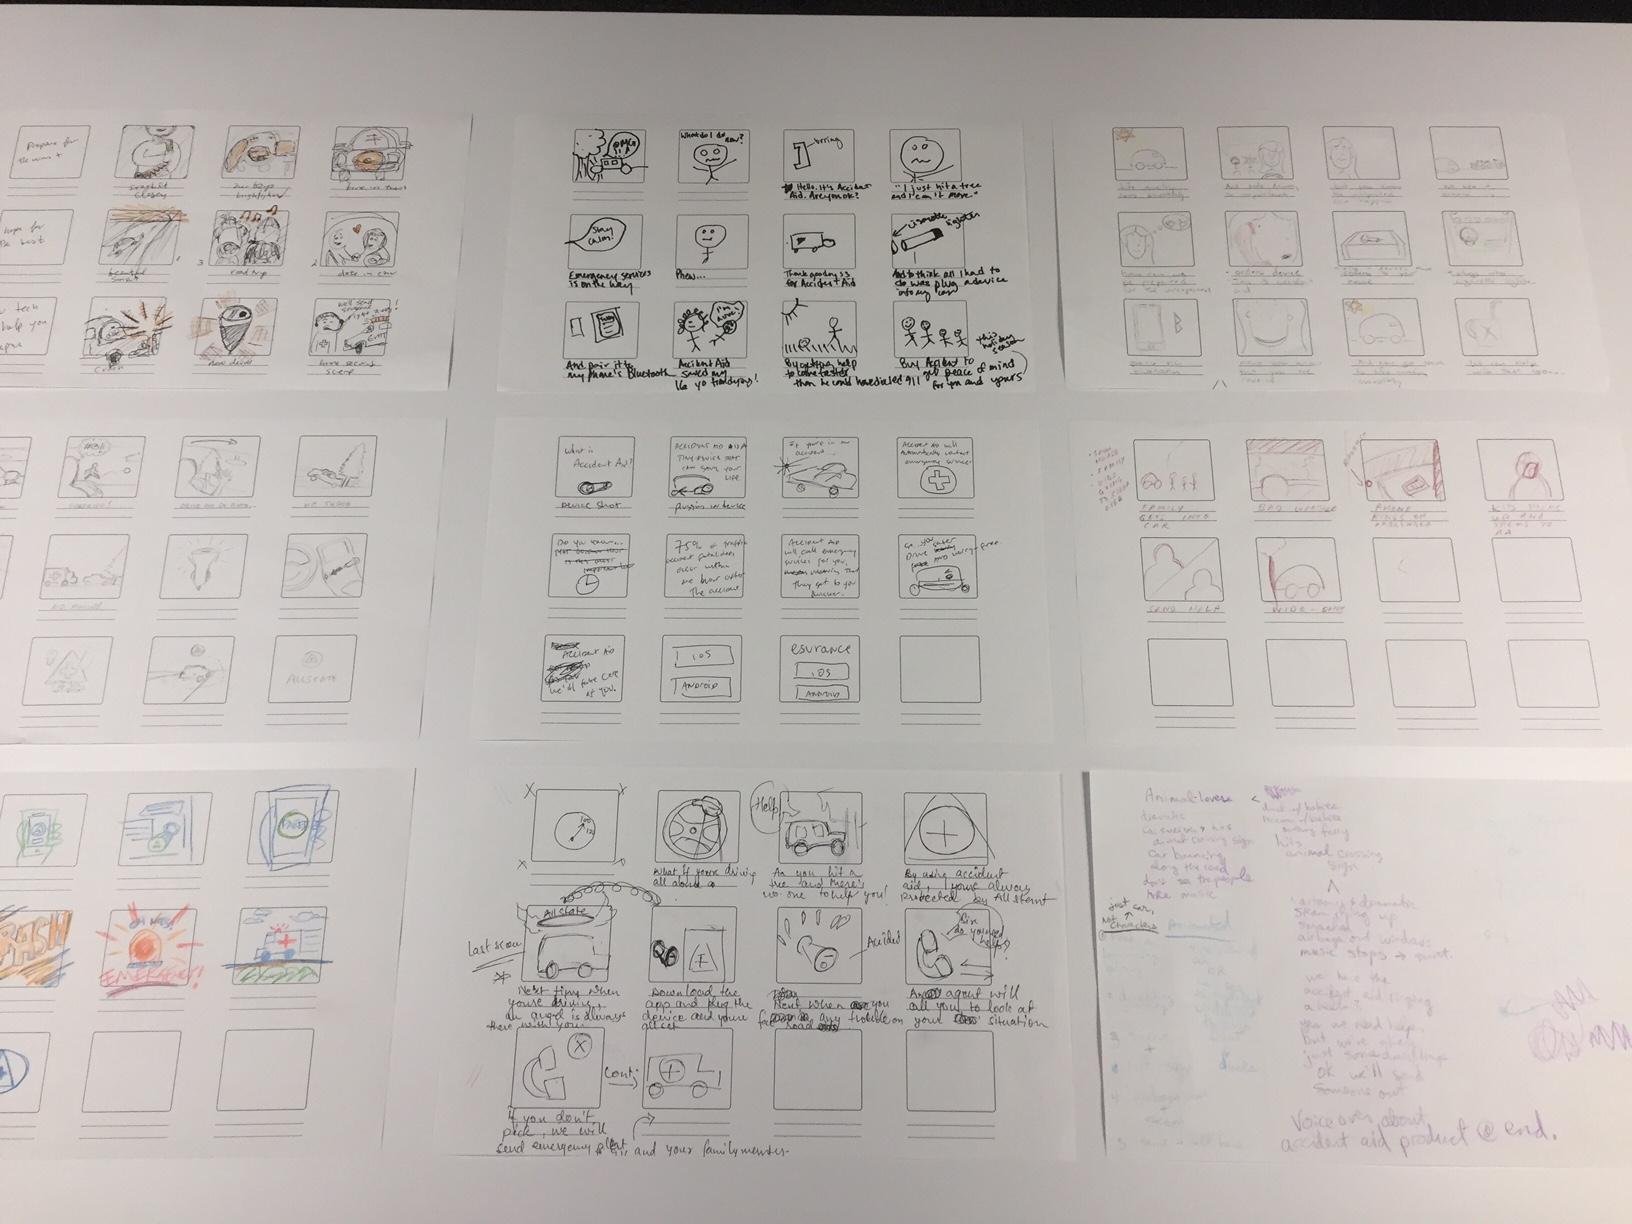 storyboarding2.jpg